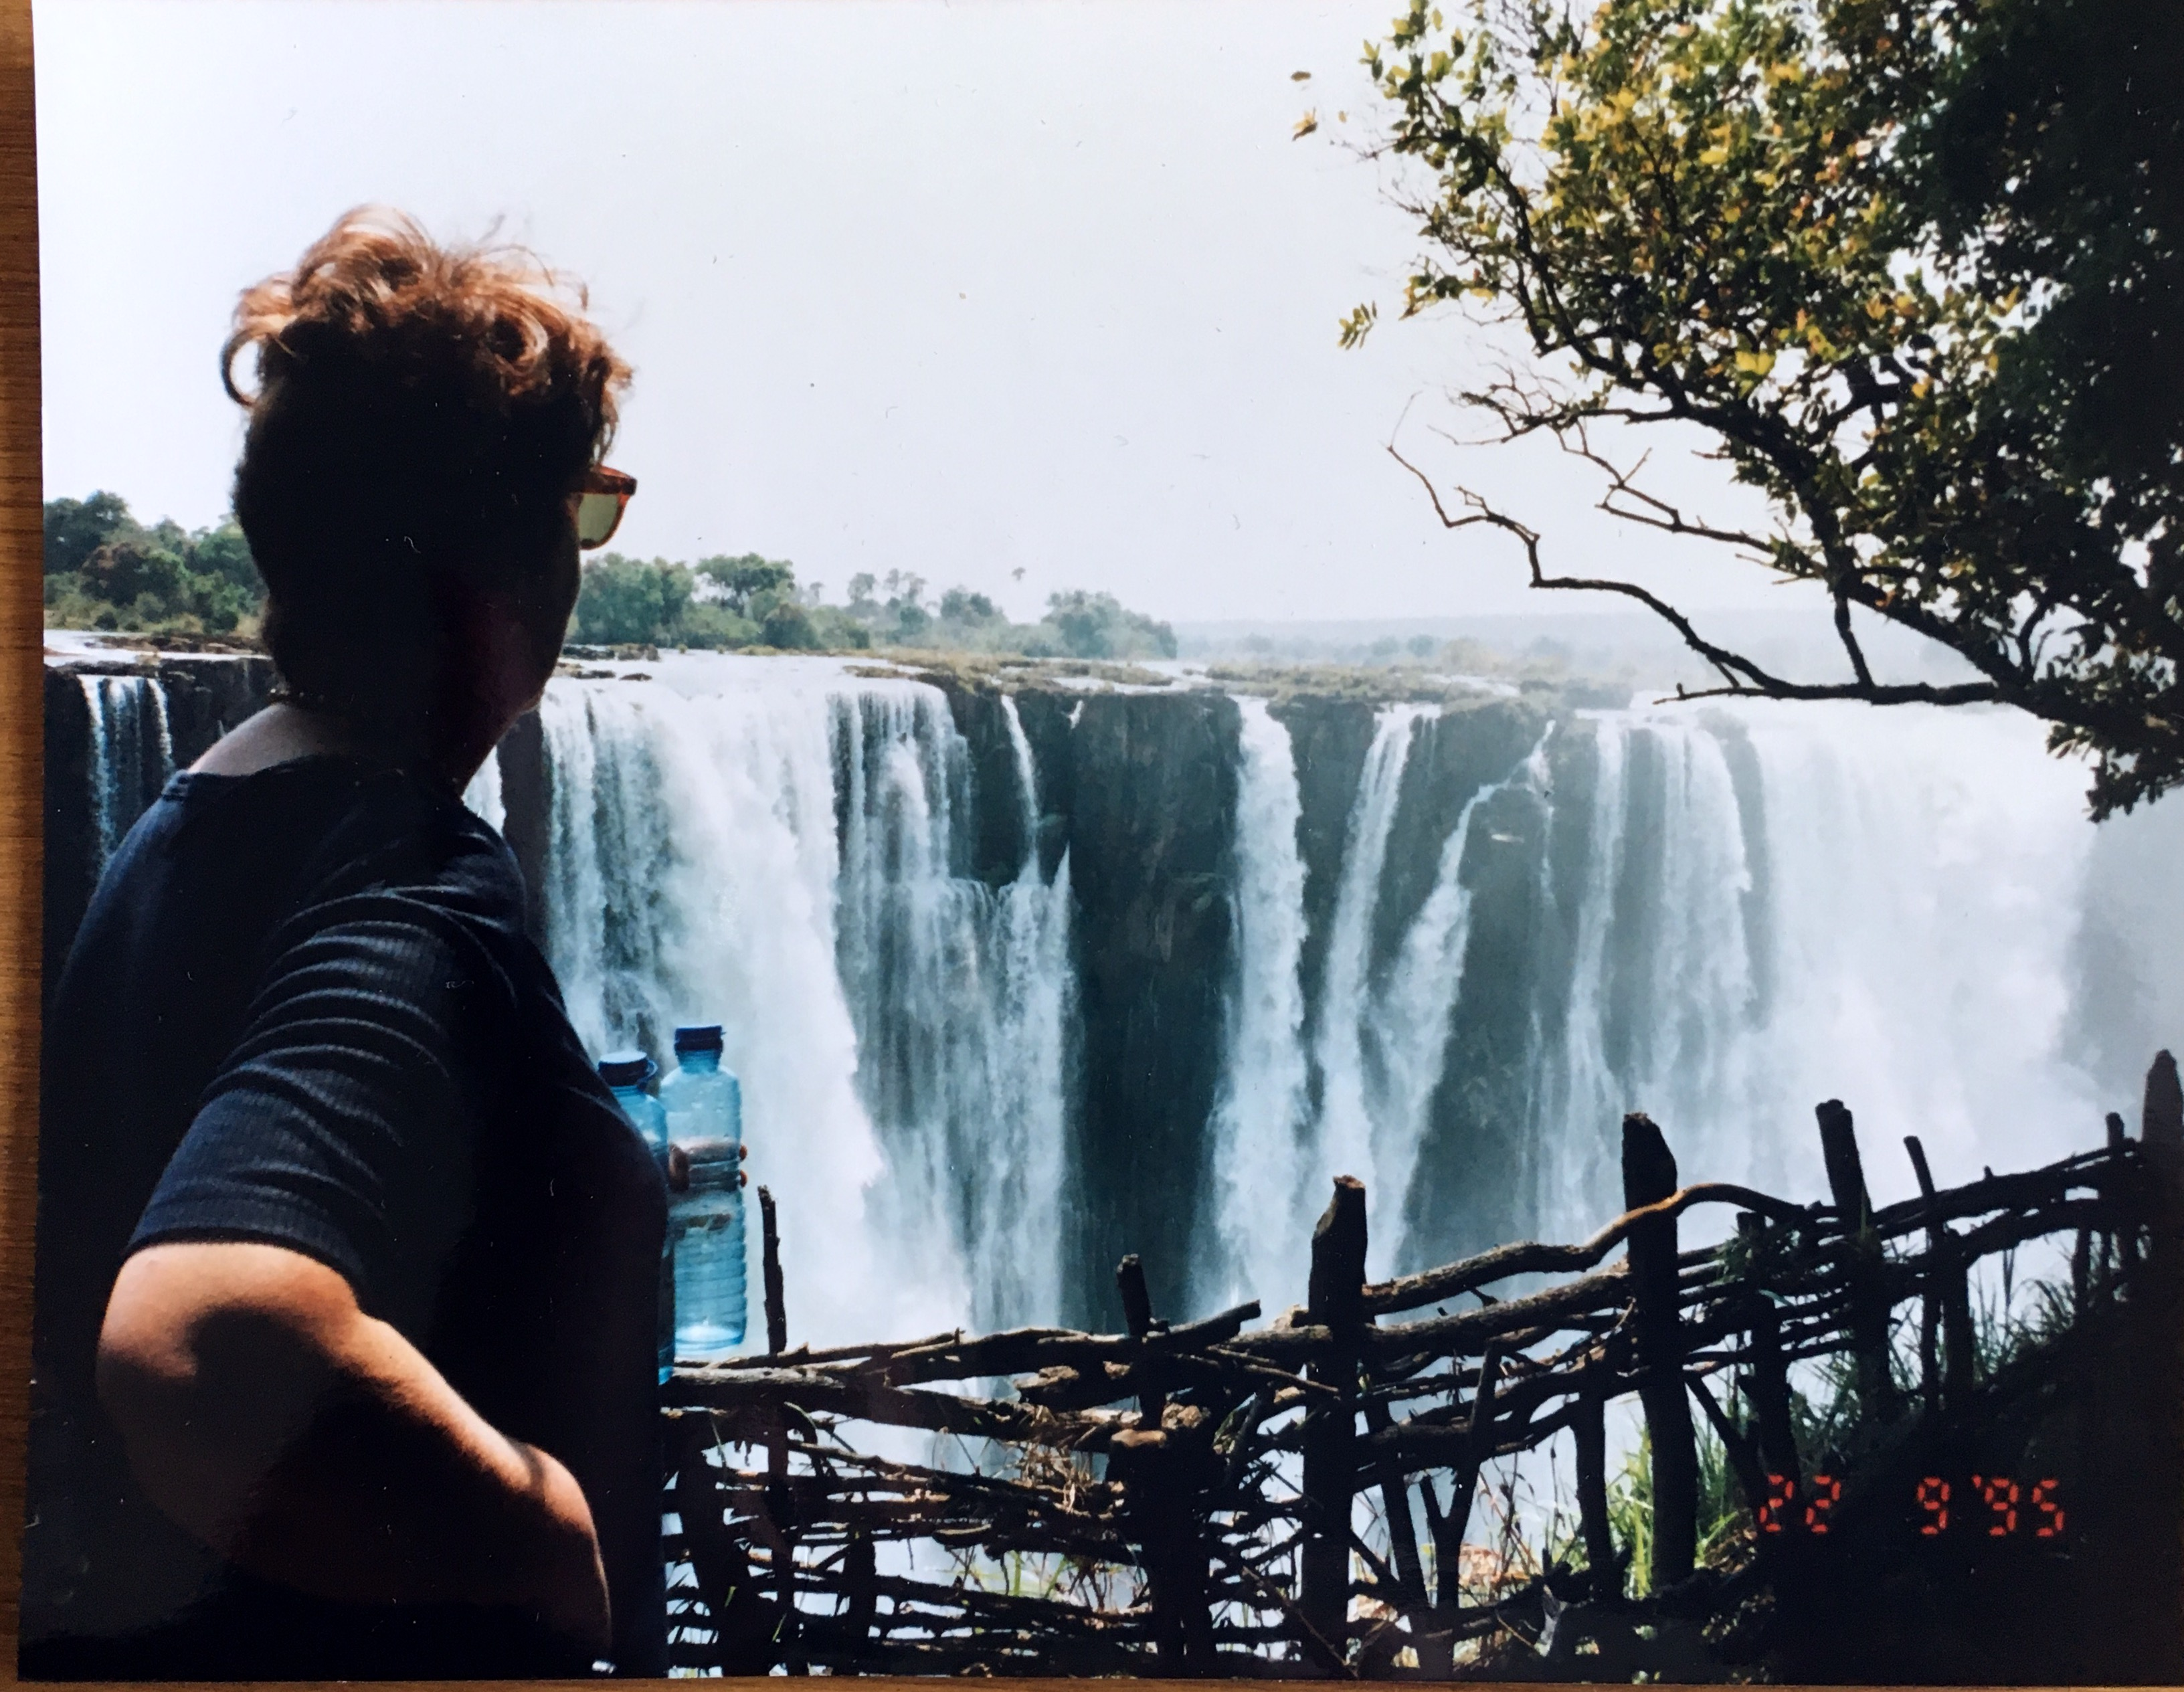 Mosi-oa-Tunya / Victoria Falls - Zimbabwe